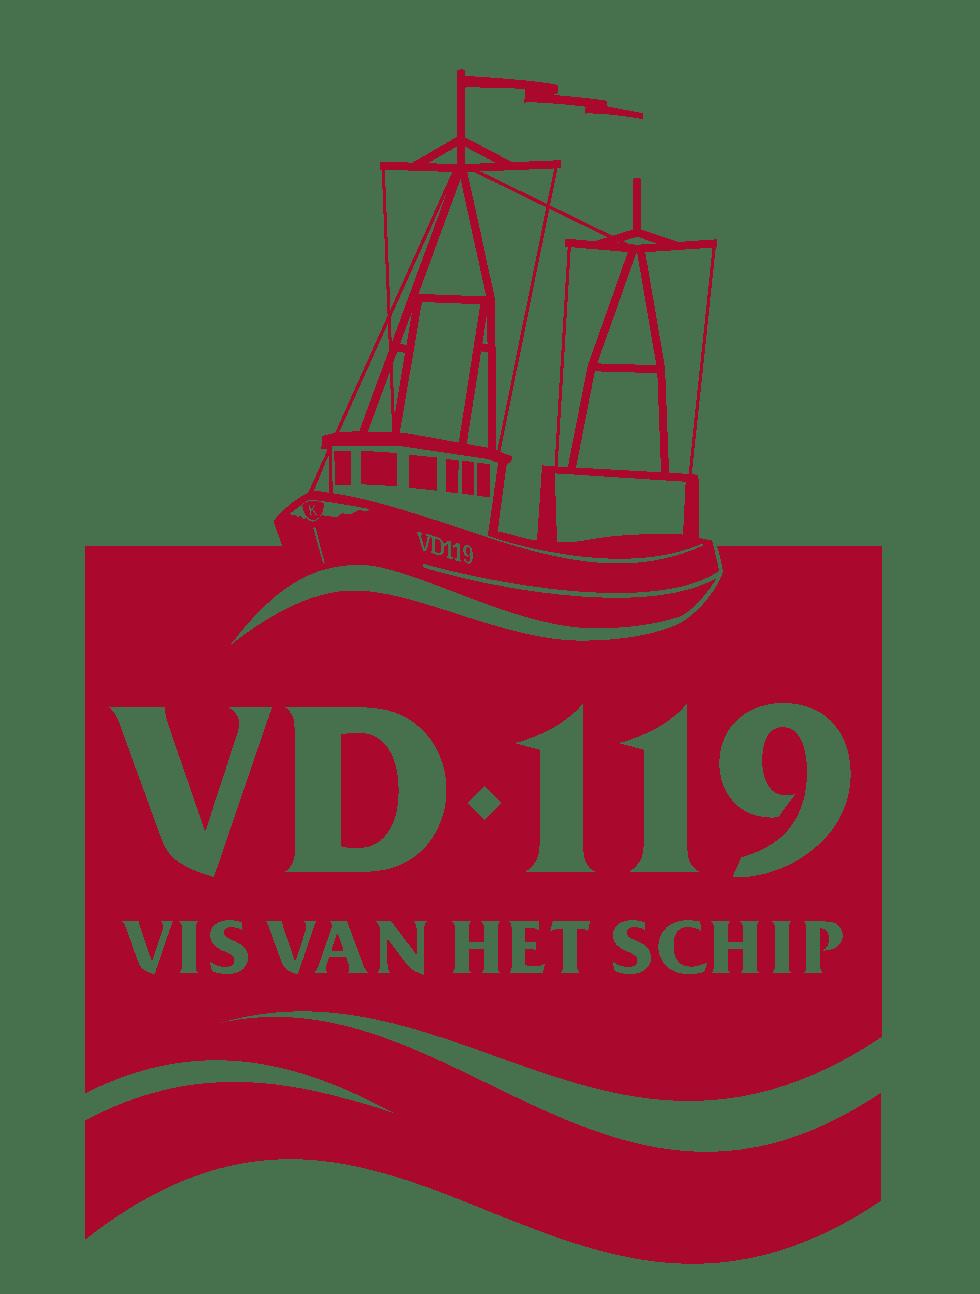 VD119 logo